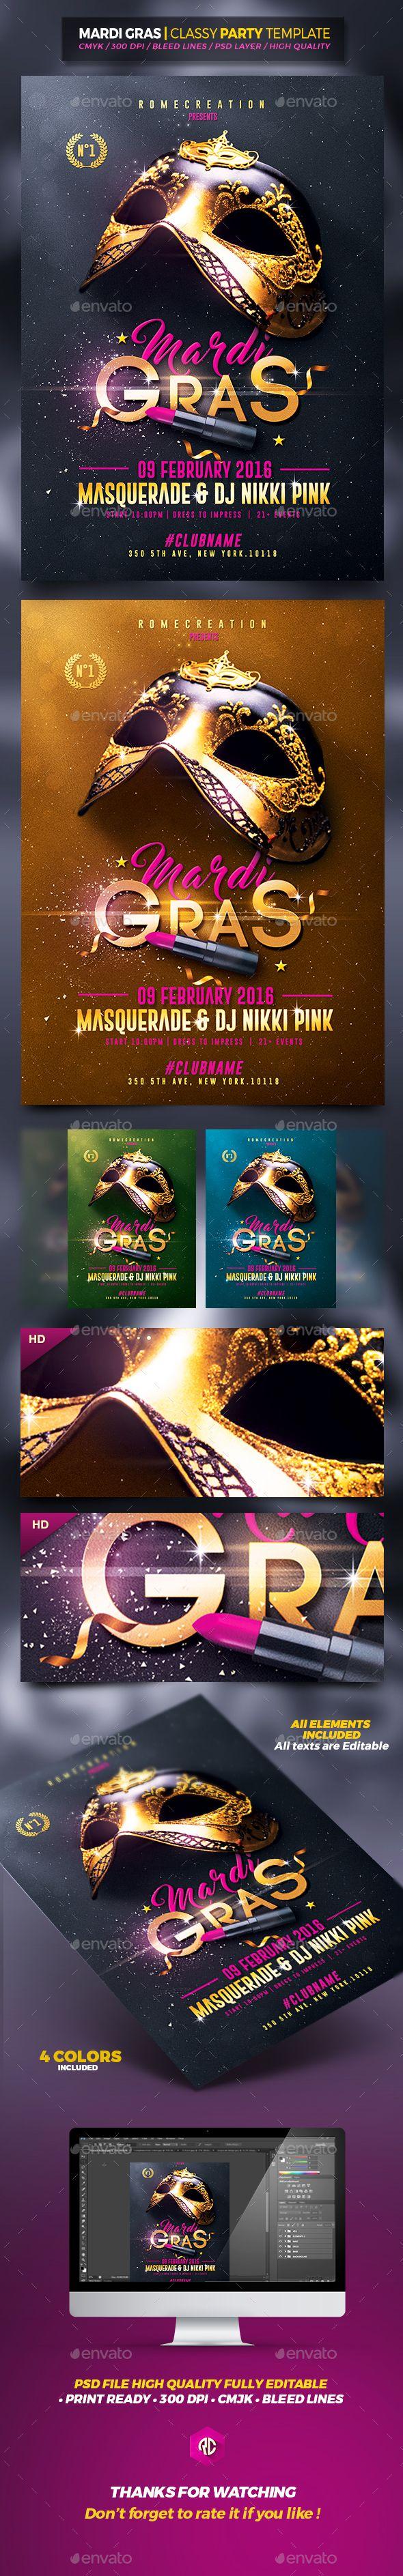 Mardi Gras | Classy Flyer Template PSD. Download here: http://graphicriver.net/item/mardi-gras-classy-flyer-template/14727583?ref=ksioks